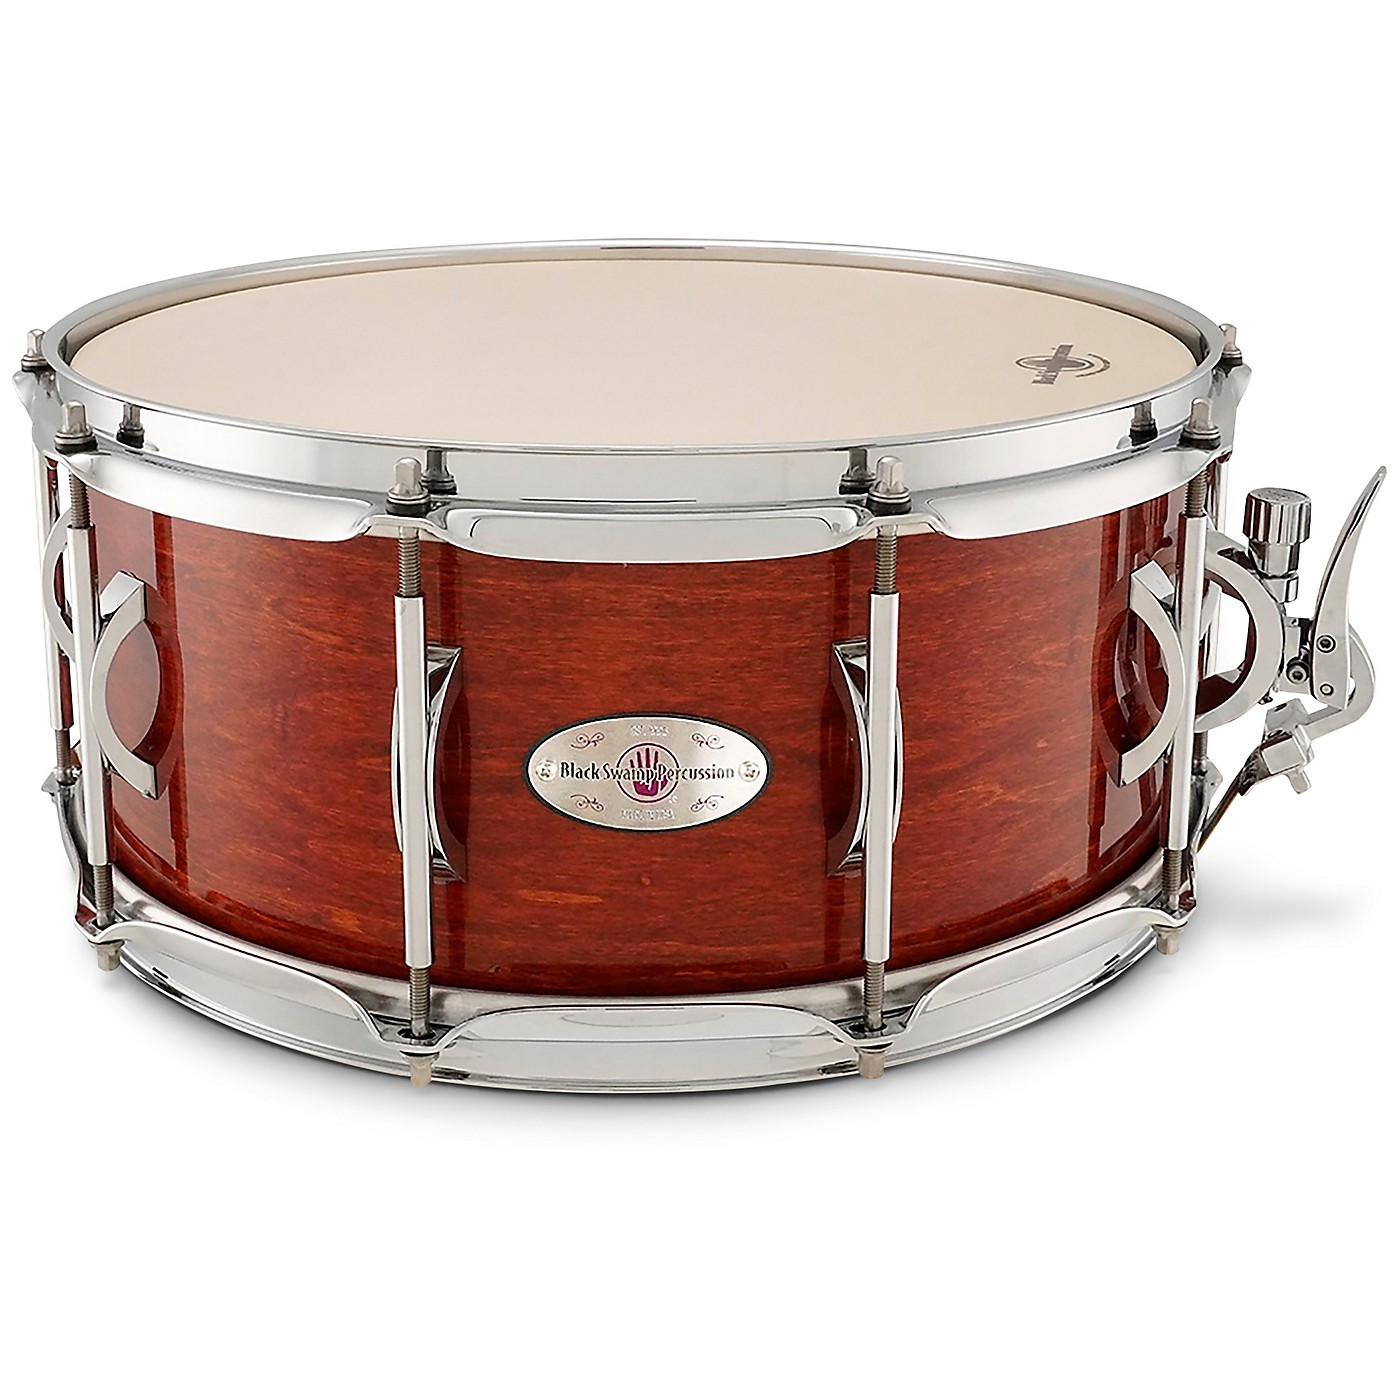 Black Swamp Percussion Pro10 Studio Maple Snare Drum thumbnail